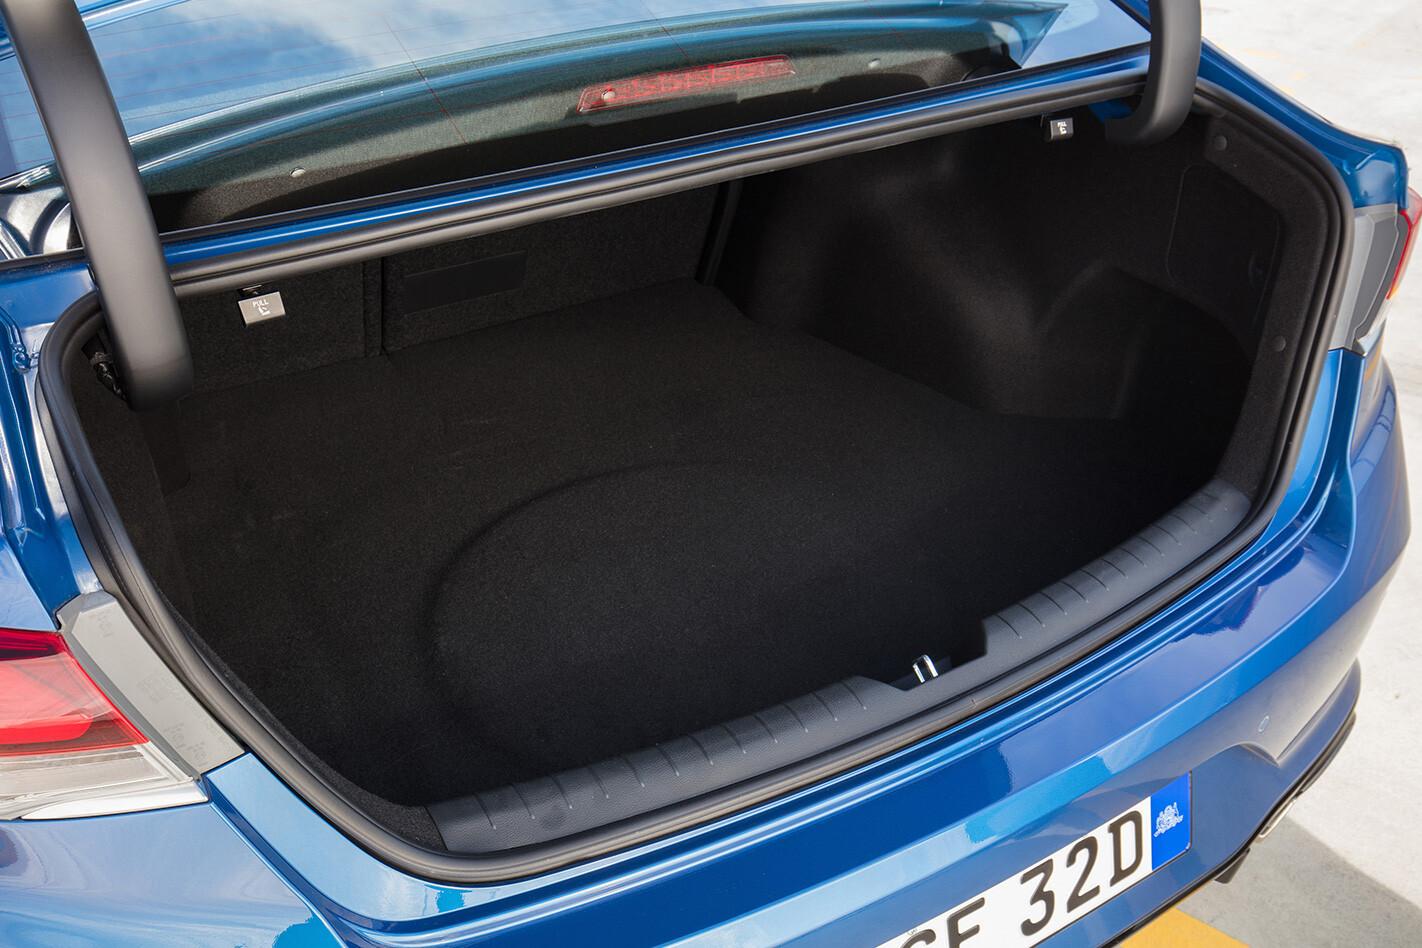 2018 Hyundai Sonata boot